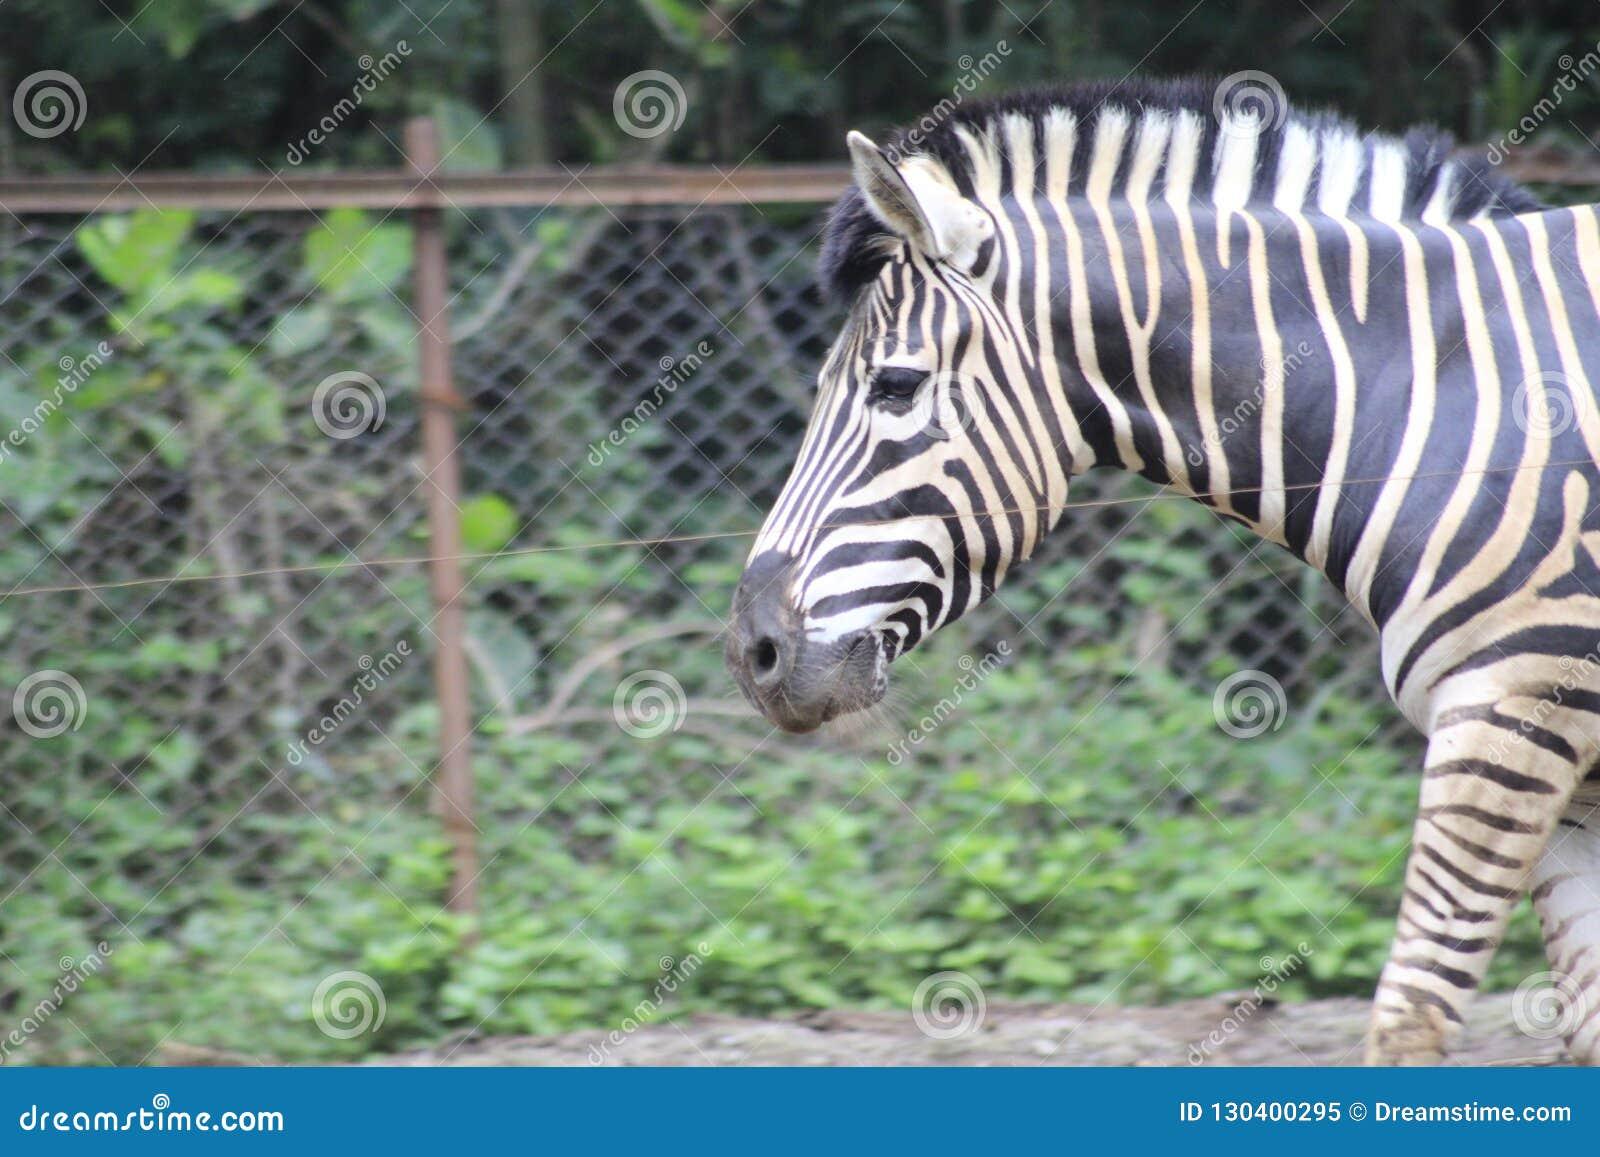 Zebra am Zoo Bandung Indonesien 3